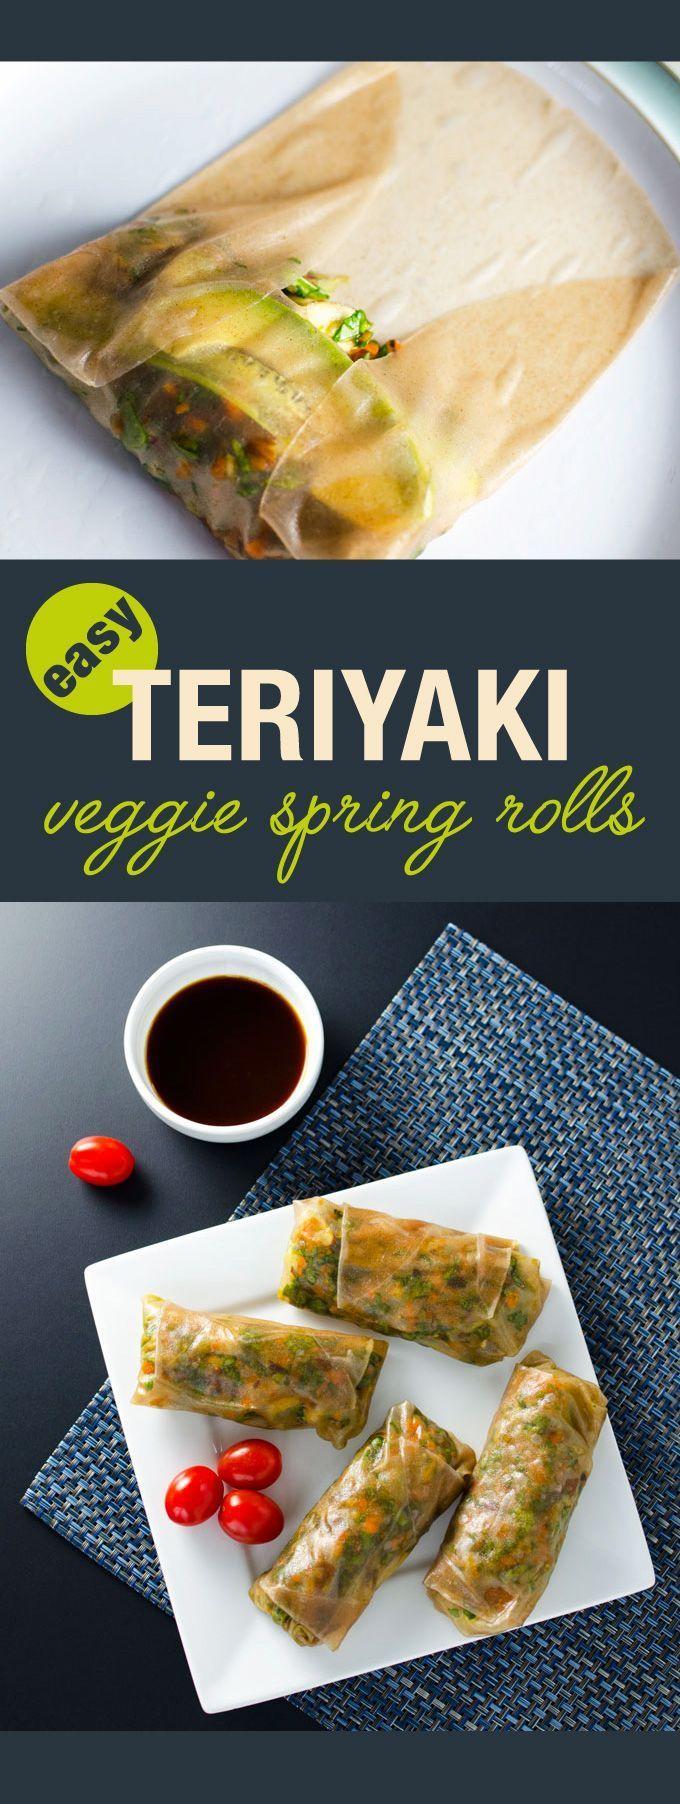 Teriyaki Veggie Spring Rolls | VeggiePrimer.com #springrolls #vegan #glutenfree